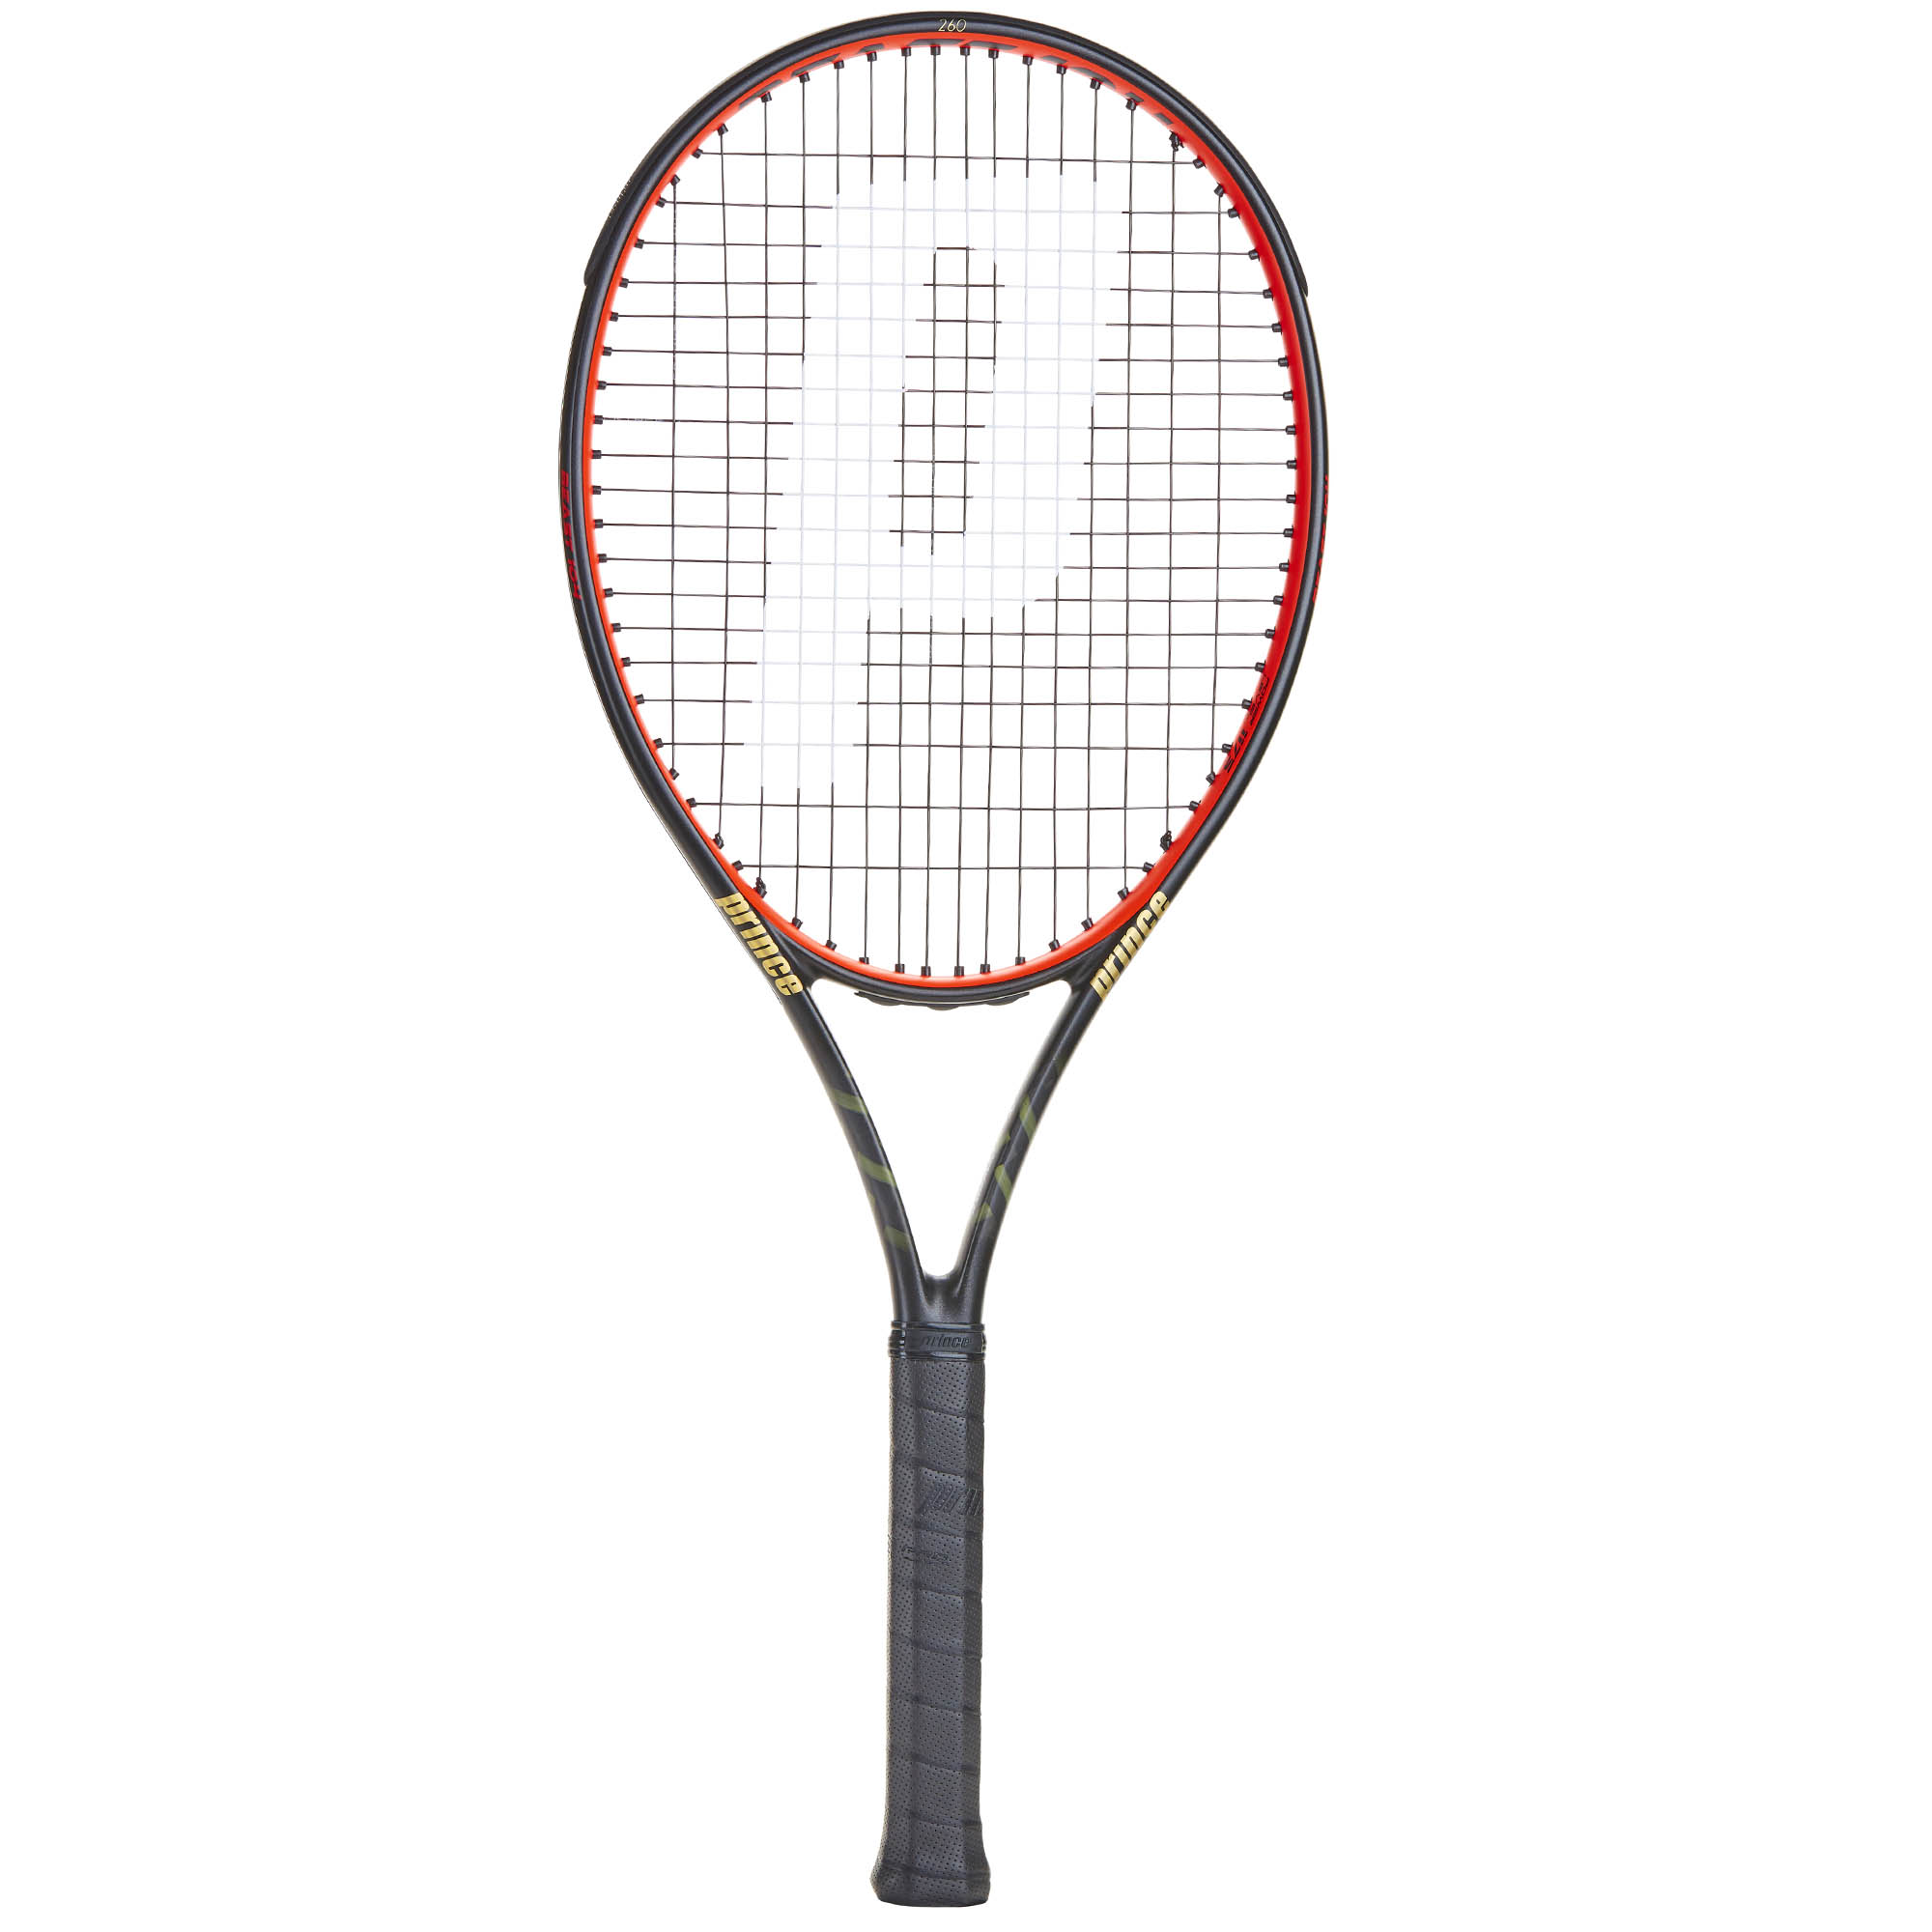 Prince TeXtreme Beast 104 260 Tennis Racket - Black/Red, Grip 2